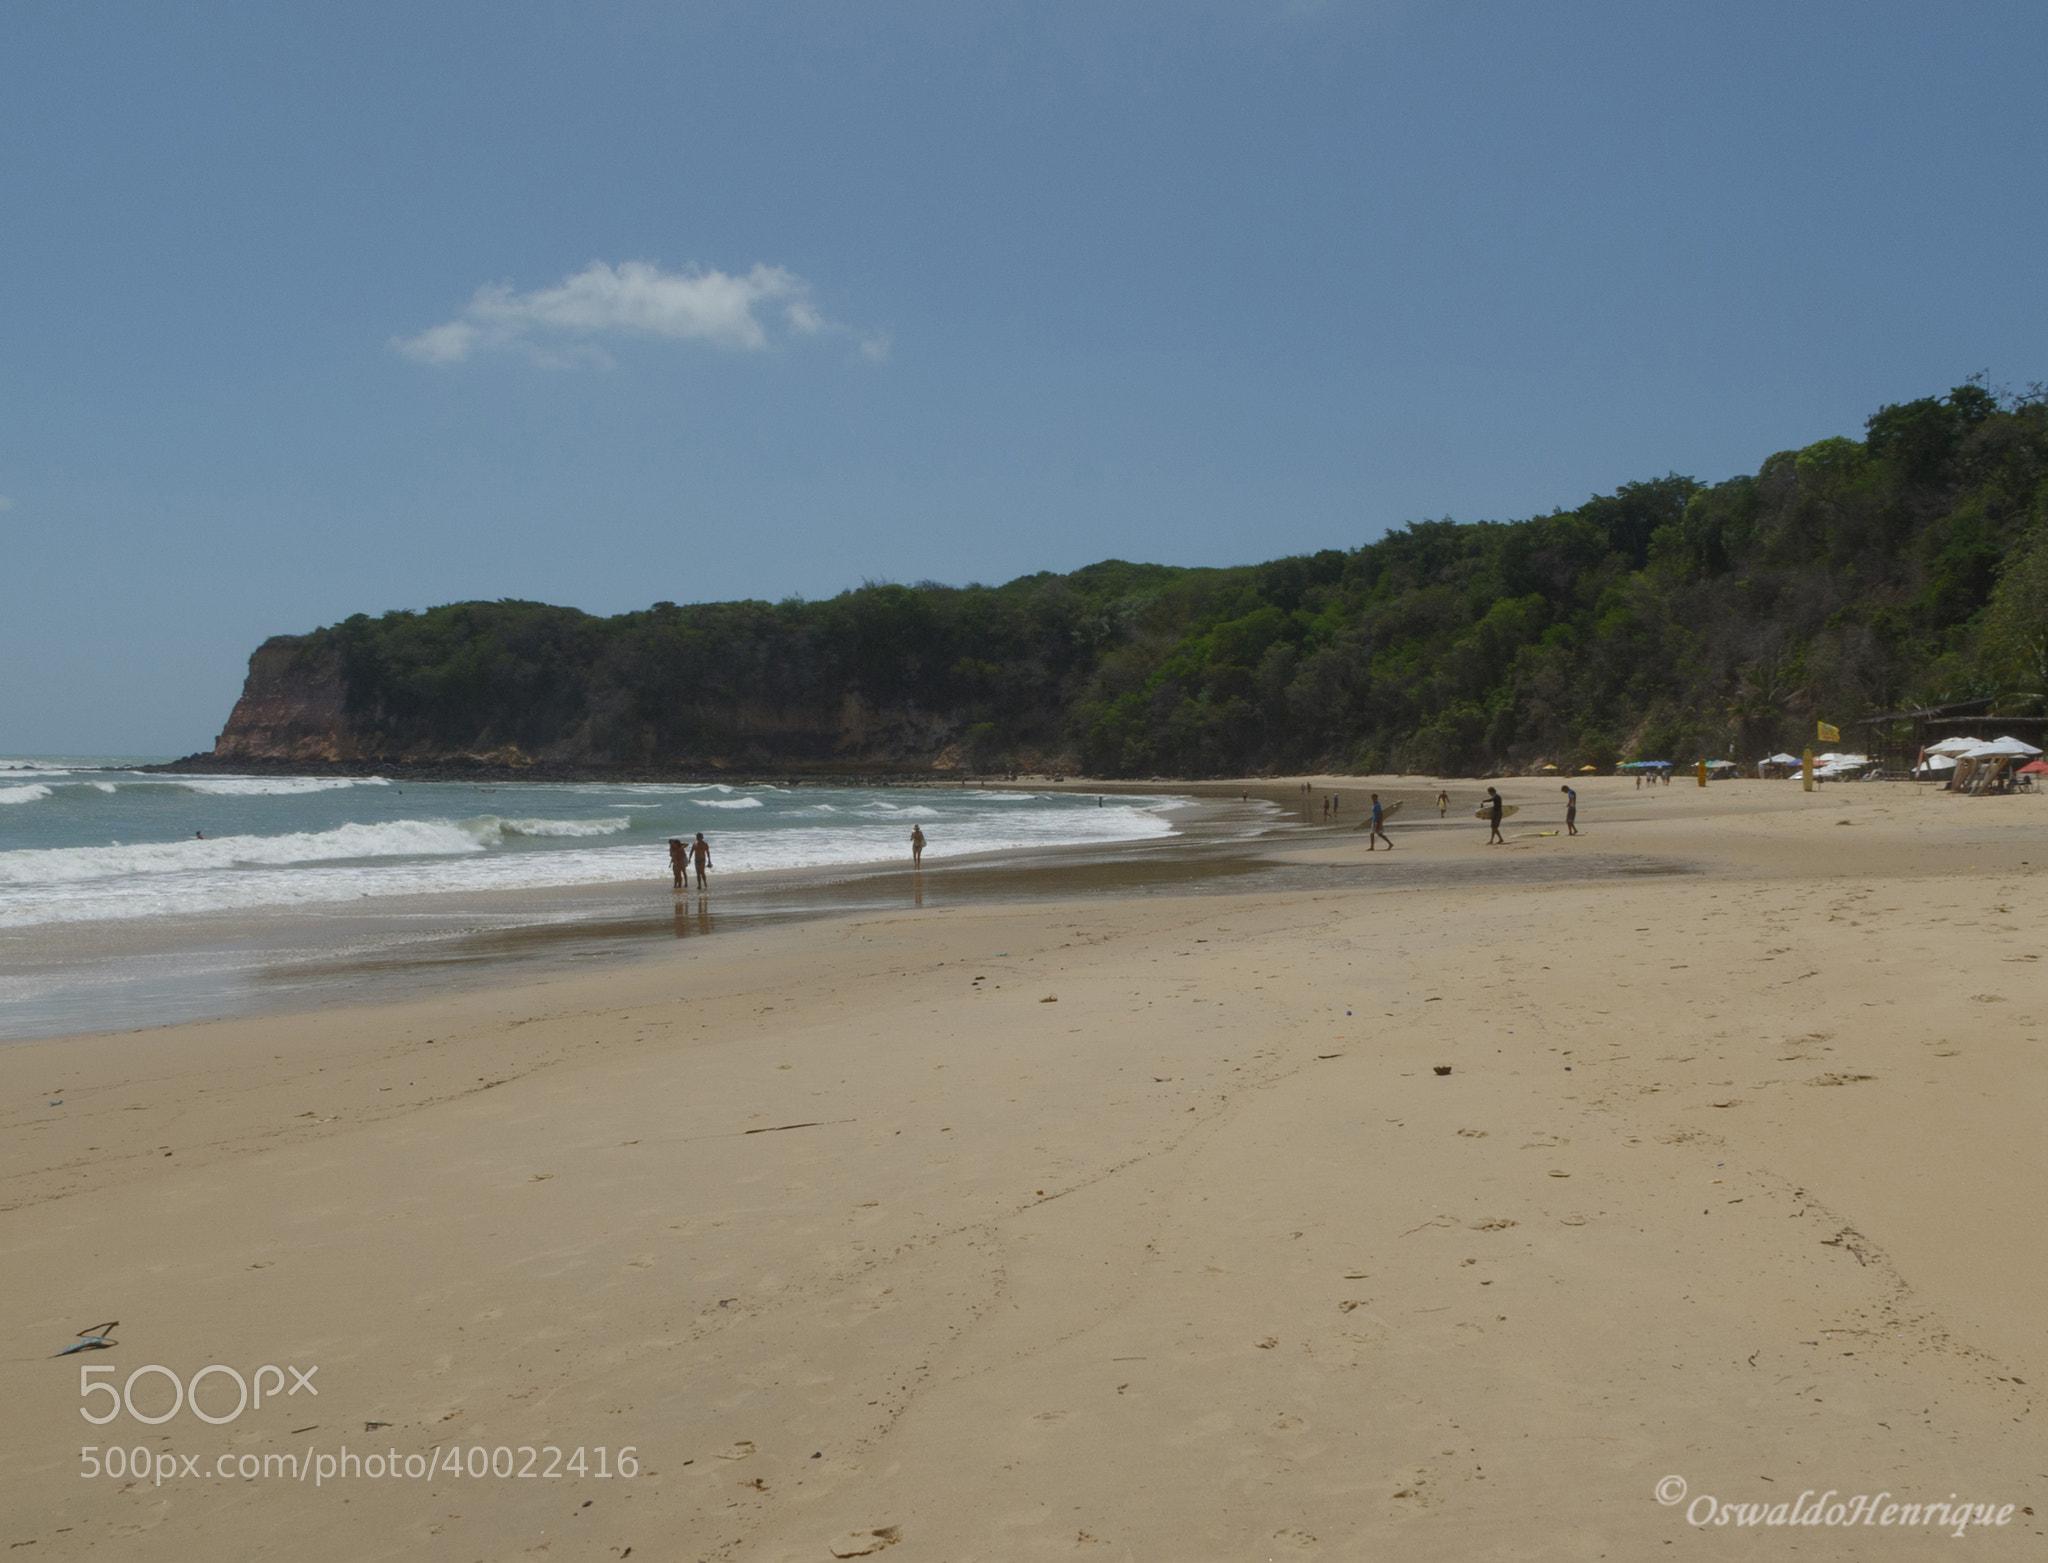 Photograph Praia do Madeiro by Oswaldo Henrique on 500px